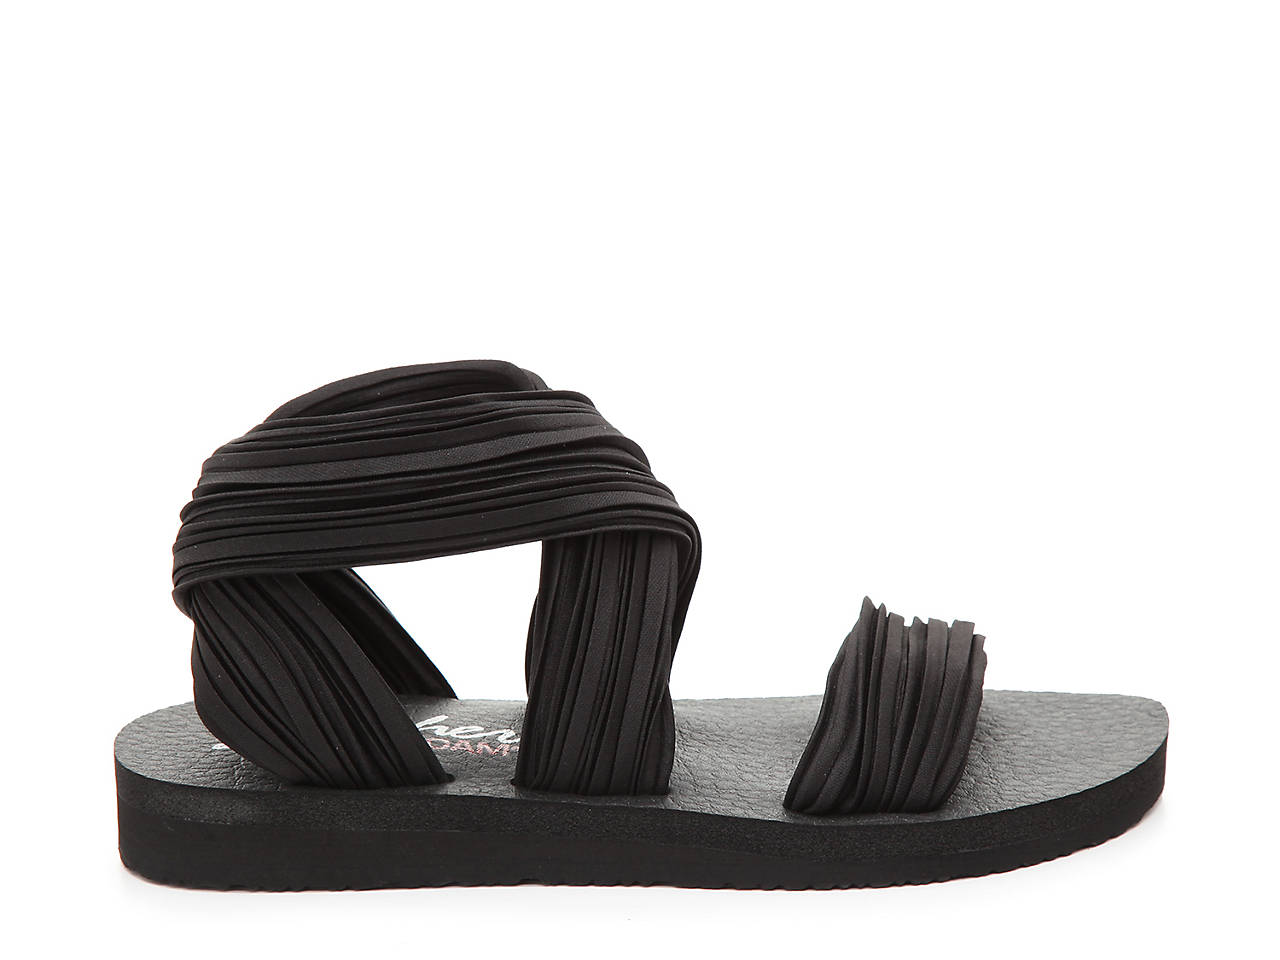 75c1c53368c Skechers Cali Meditation Still Sky Sandal Women s Shoes